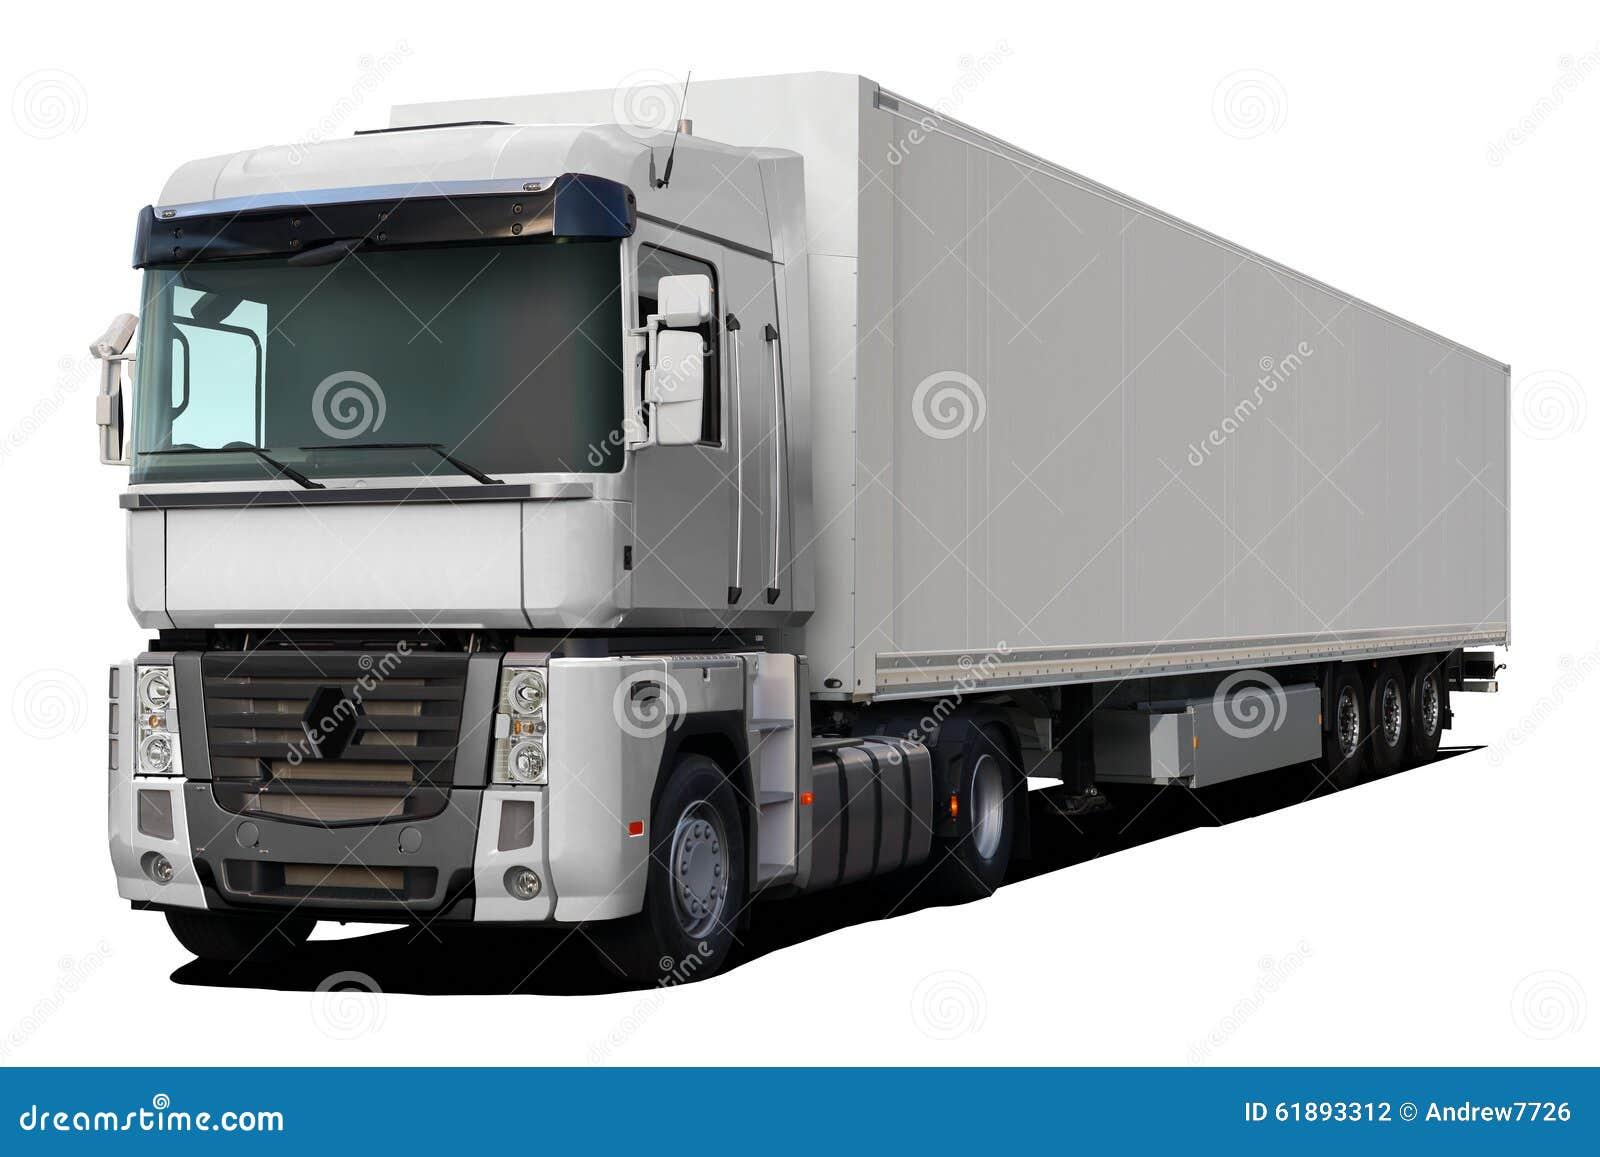 magnum blanc de renault de camion photo stock image 61893312. Black Bedroom Furniture Sets. Home Design Ideas